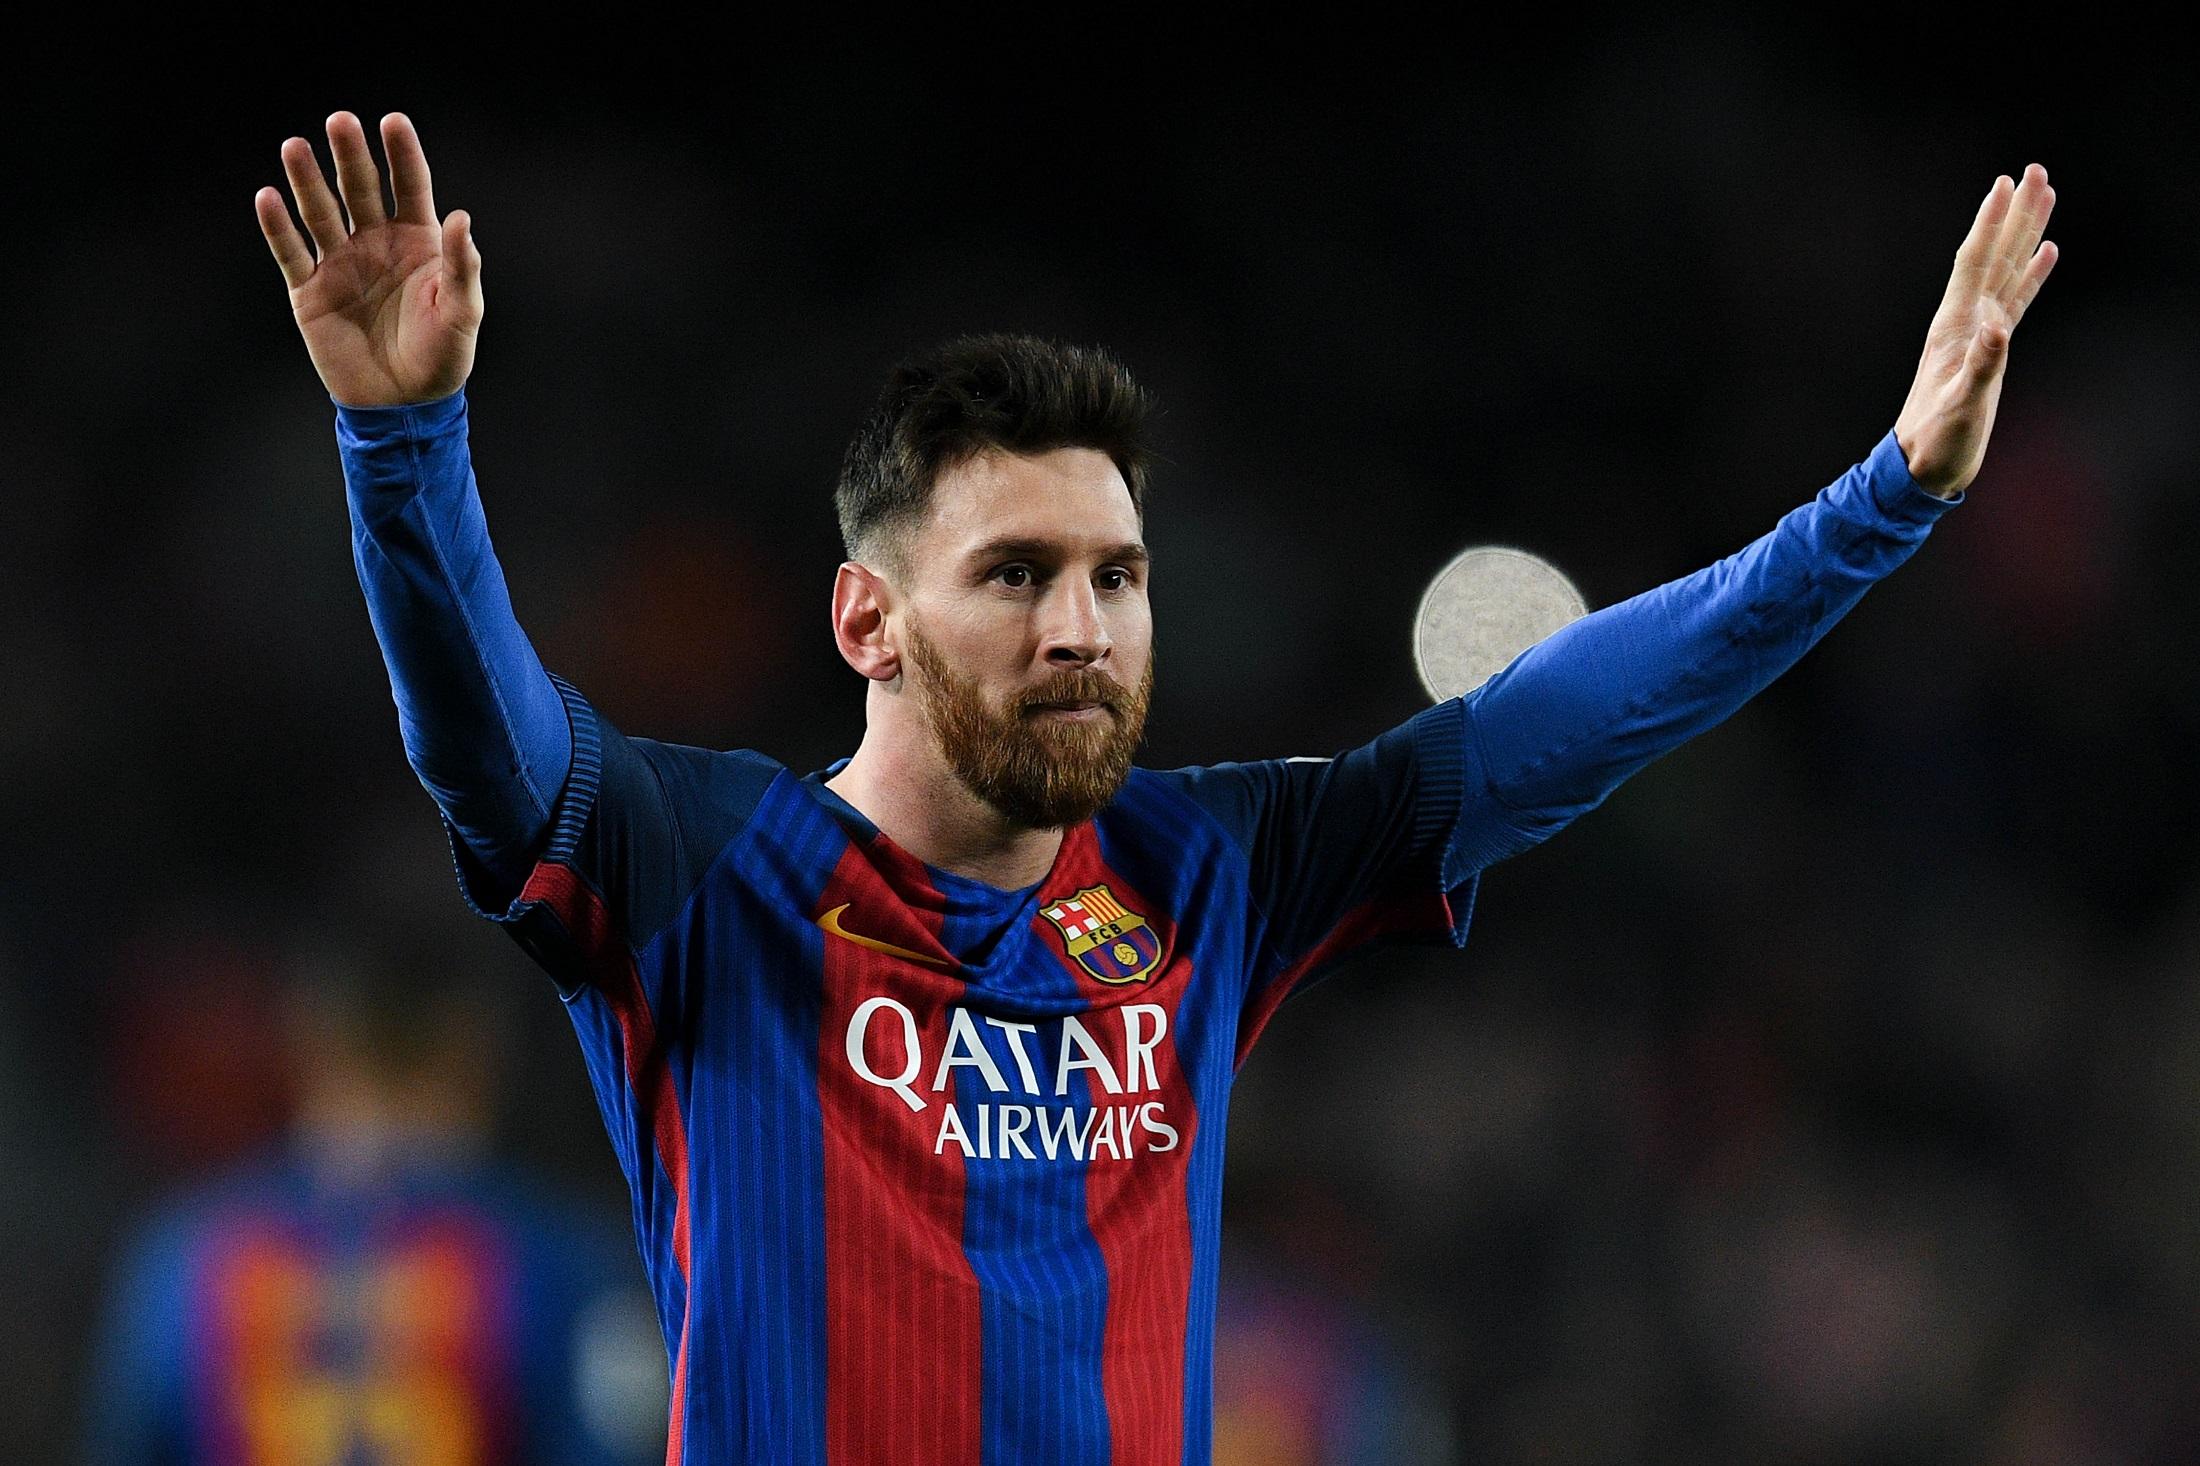 Messi ya acaricia su Bota de Oro e iguala a Cristiano Ronaldo